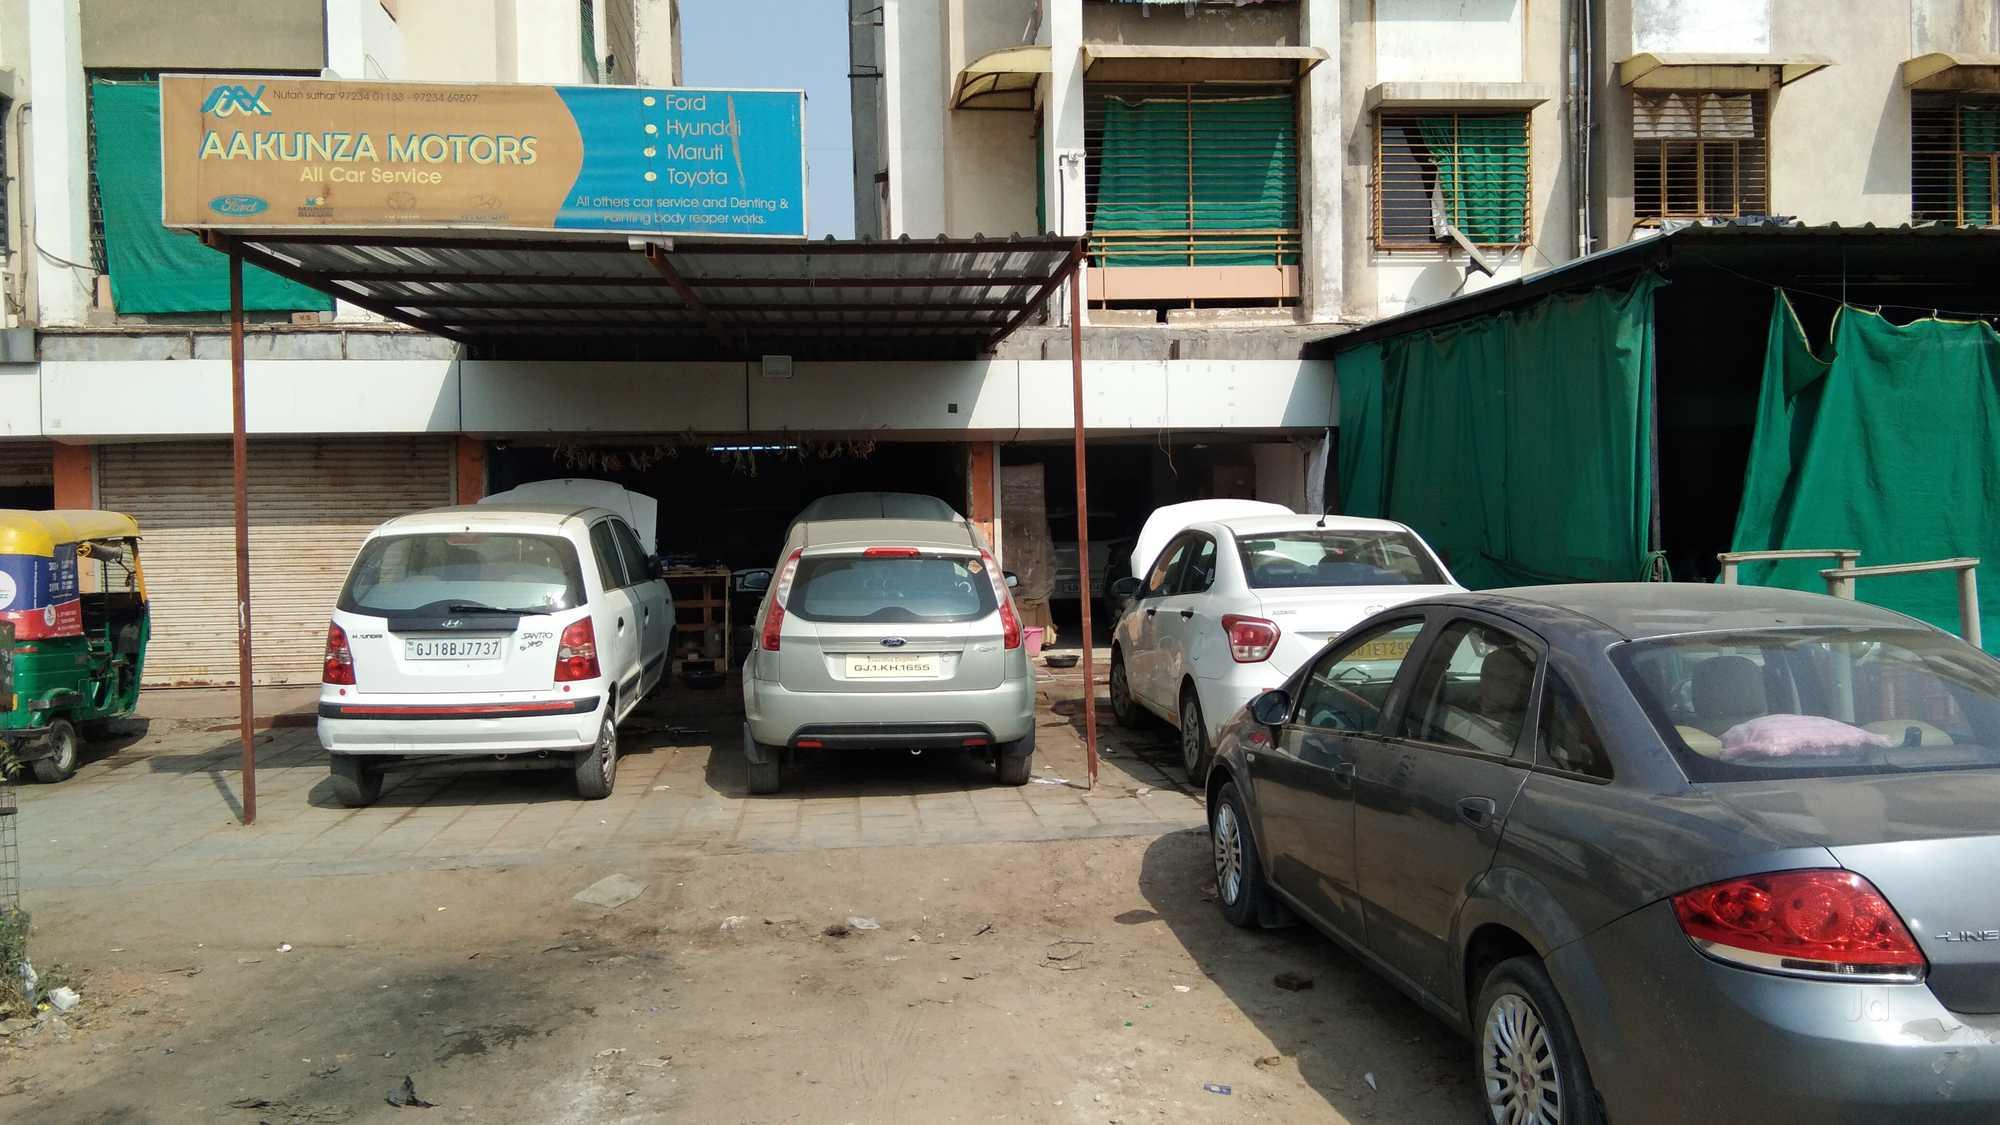 Top 20 Volkswagen Vento Car Repair & Services in Ahmedabad - Best